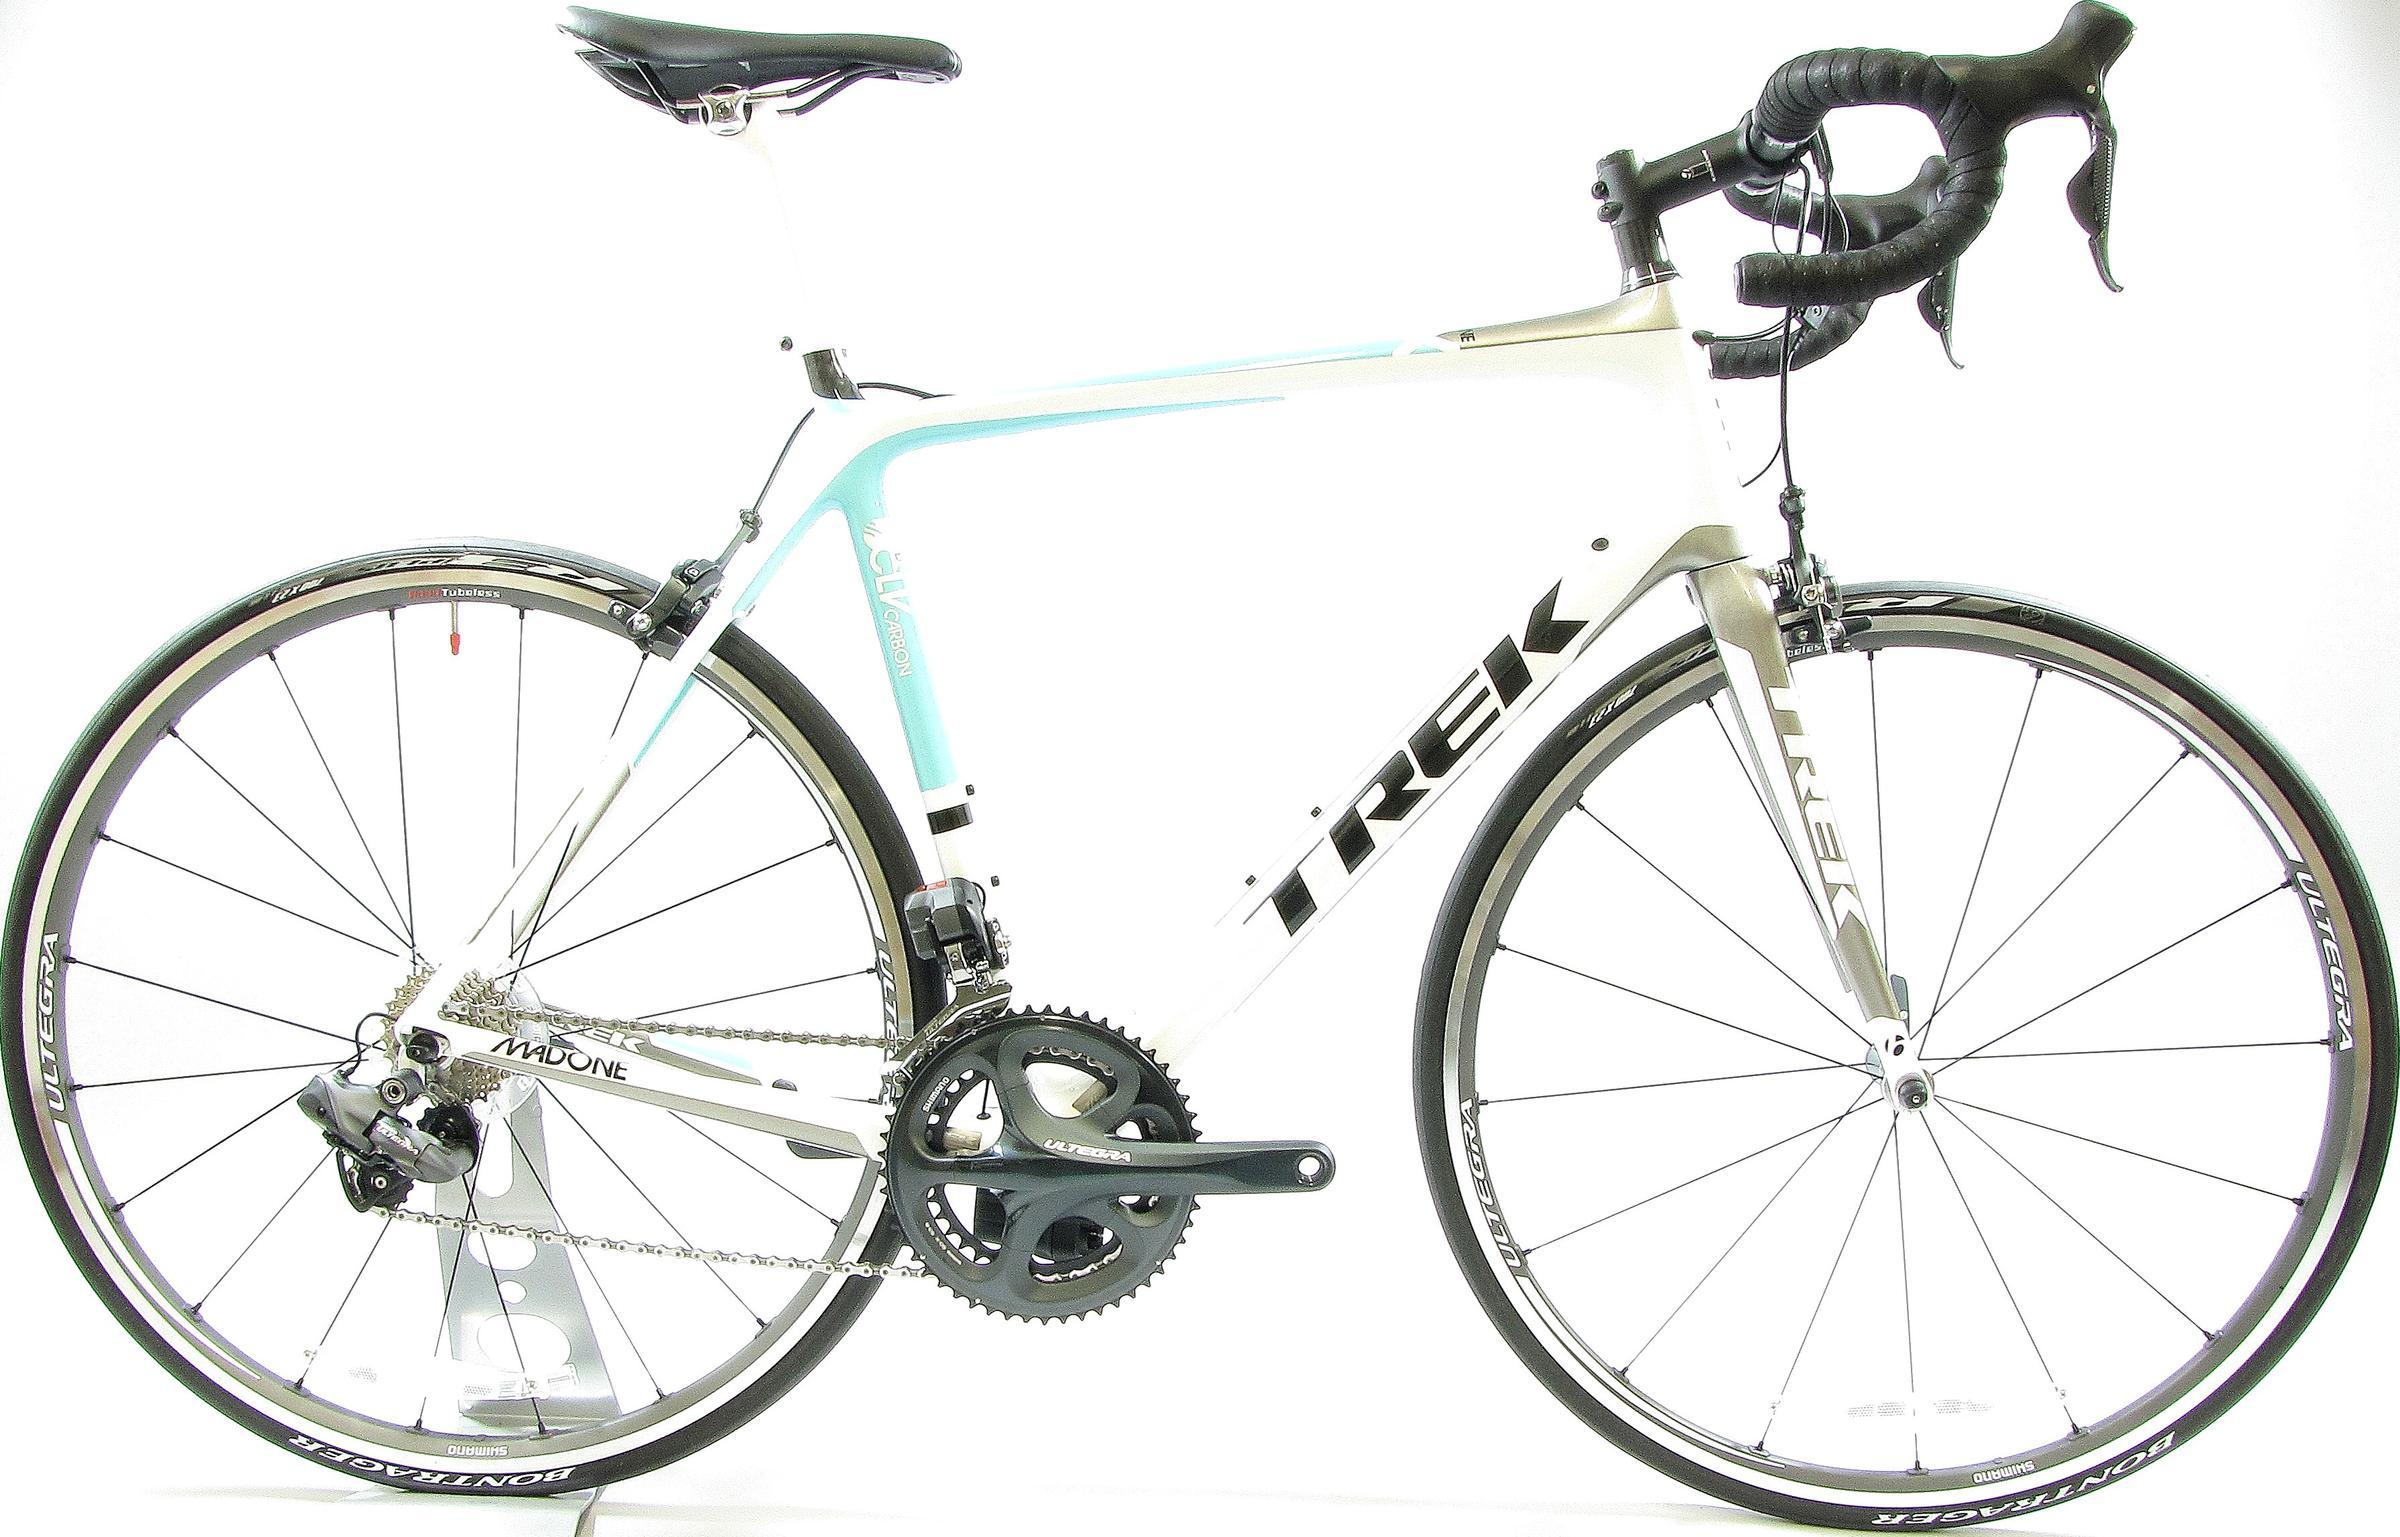 Stupendous Trek Madone 6 2 H2 C Show Bike Trekbicyclesuperstore Com Beatyapartments Chair Design Images Beatyapartmentscom